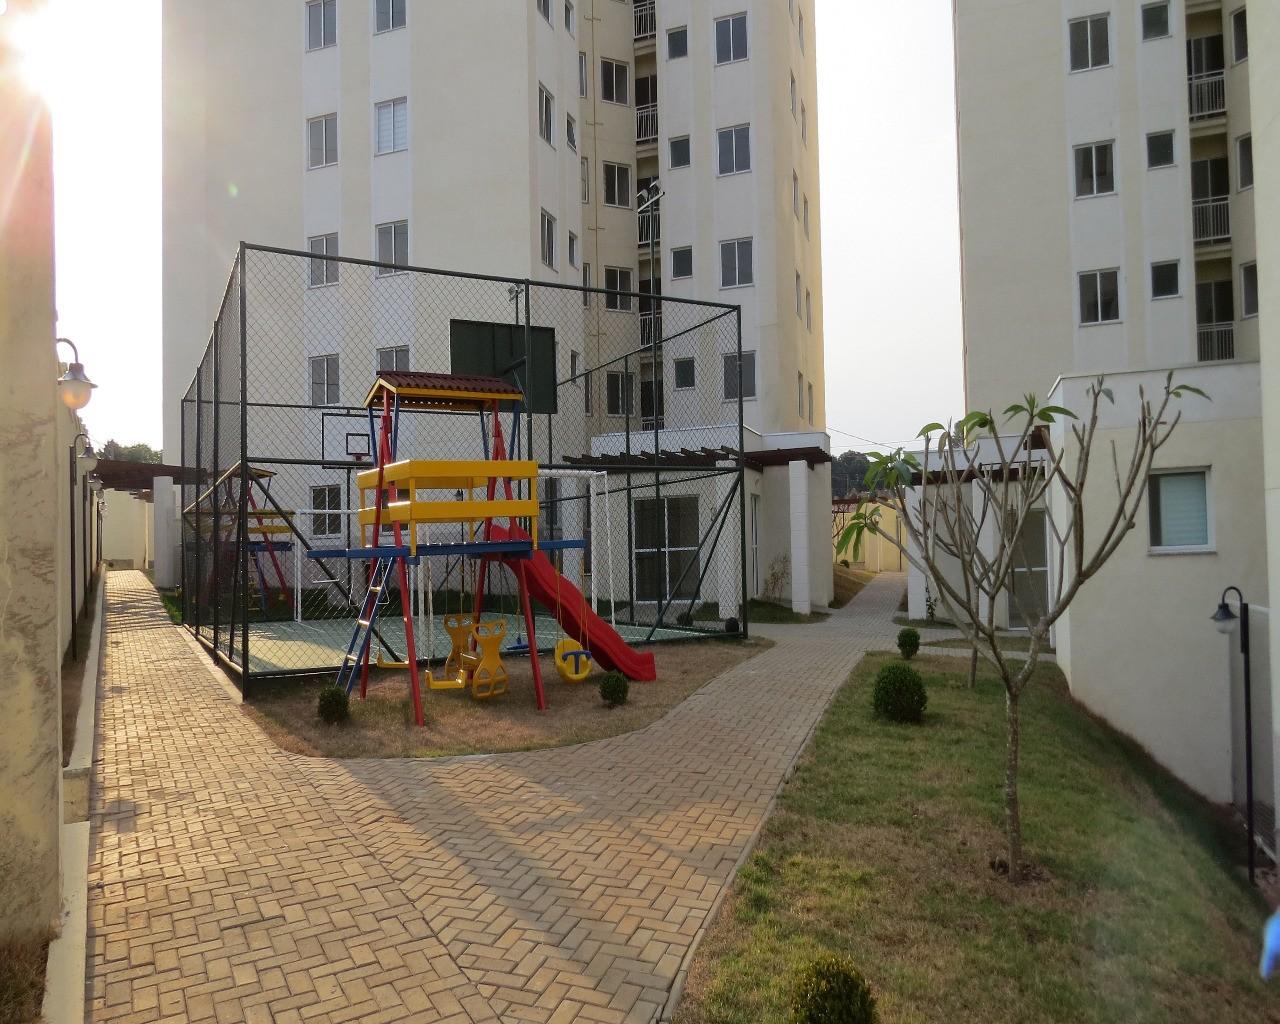 comprar ou alugar apartamento no bairro alto dos pinheiros na cidade de paulínia-sp